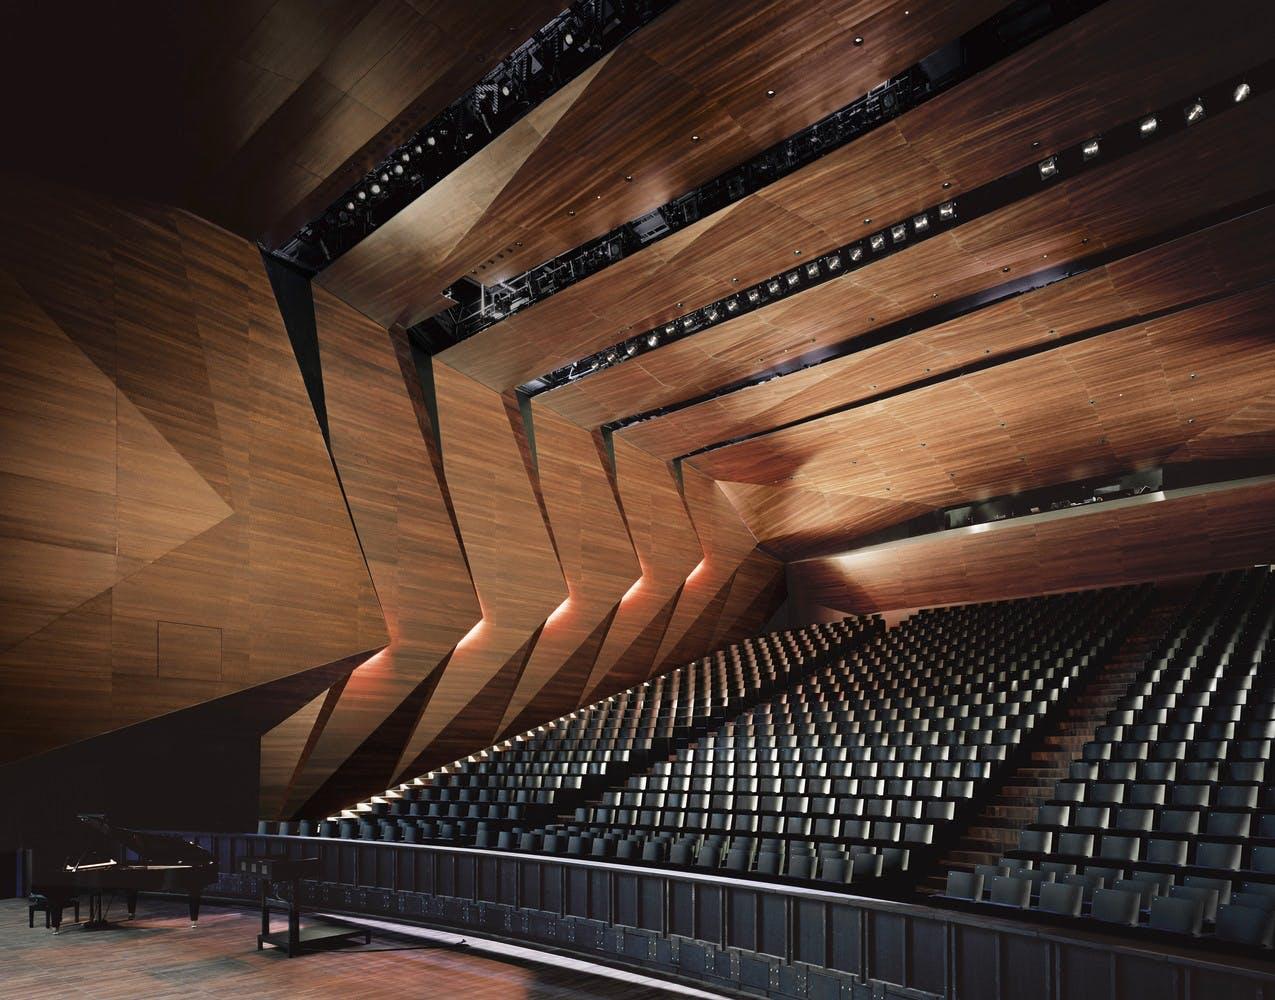 Festival Hall of the Tiroler Festspiele Erl, Østrig